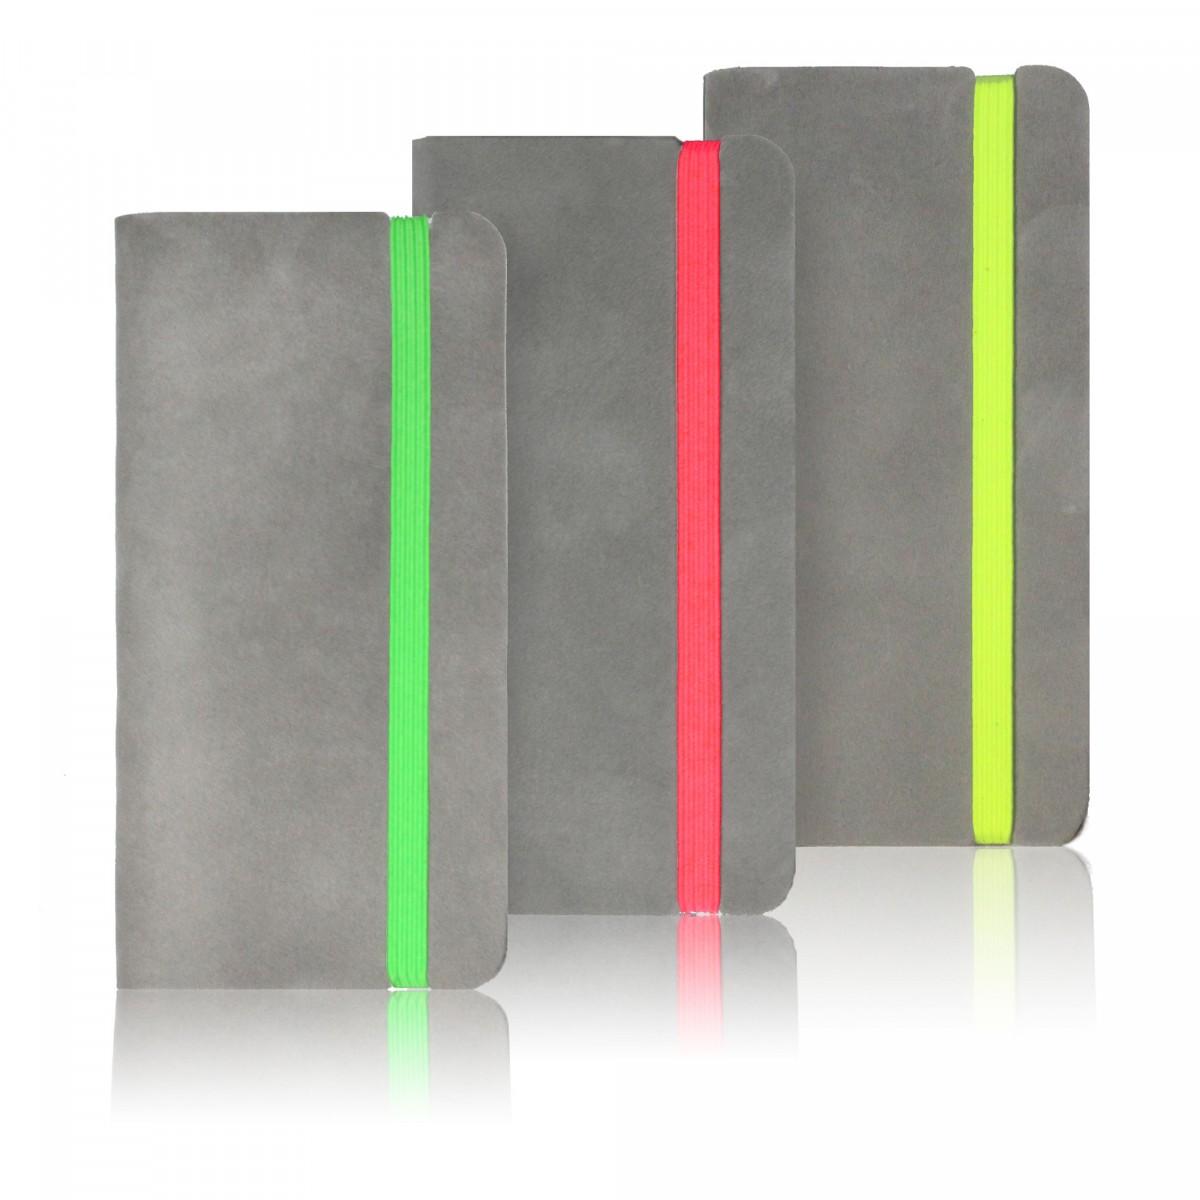 VANDEBAG - WHIZZ Cover für's iPhone 5/5s/5c aus Nubukleder